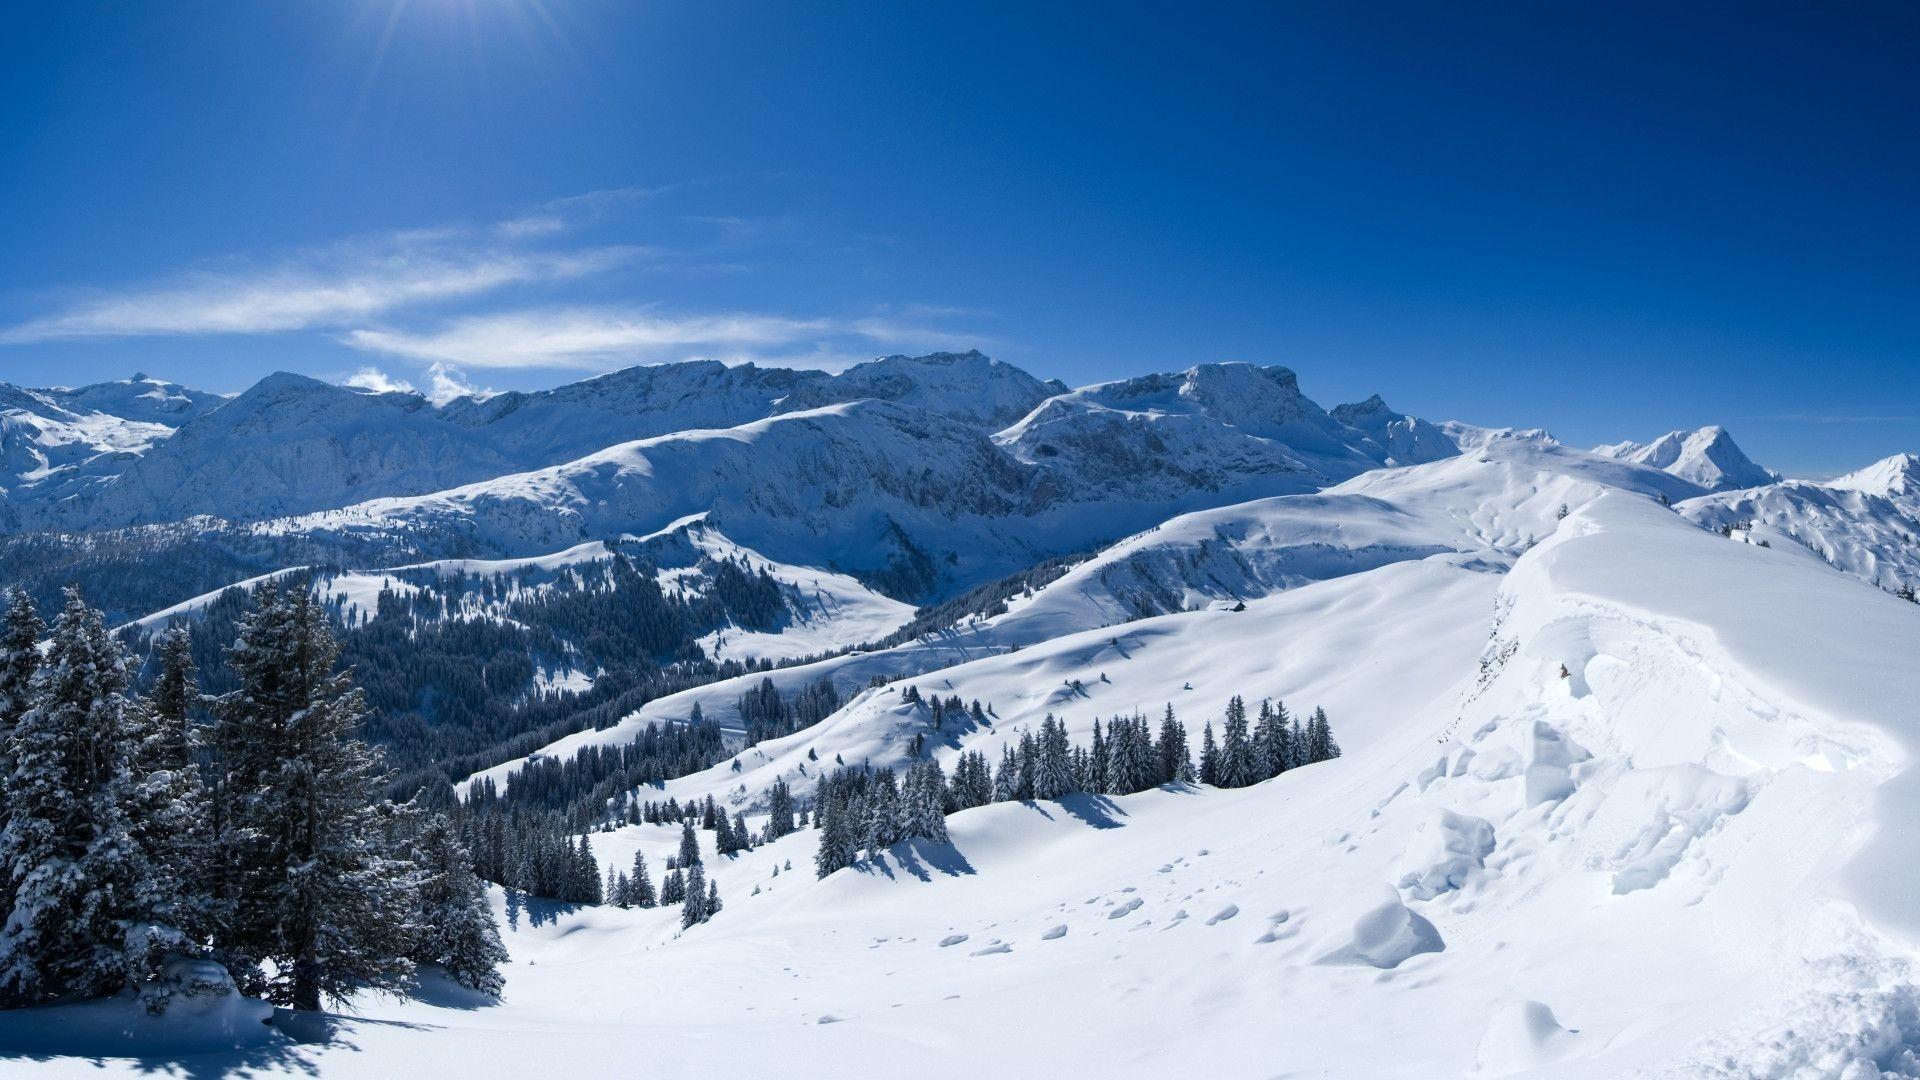 Snow Mountain Wallpapers Full Hd As Wallpaper HD